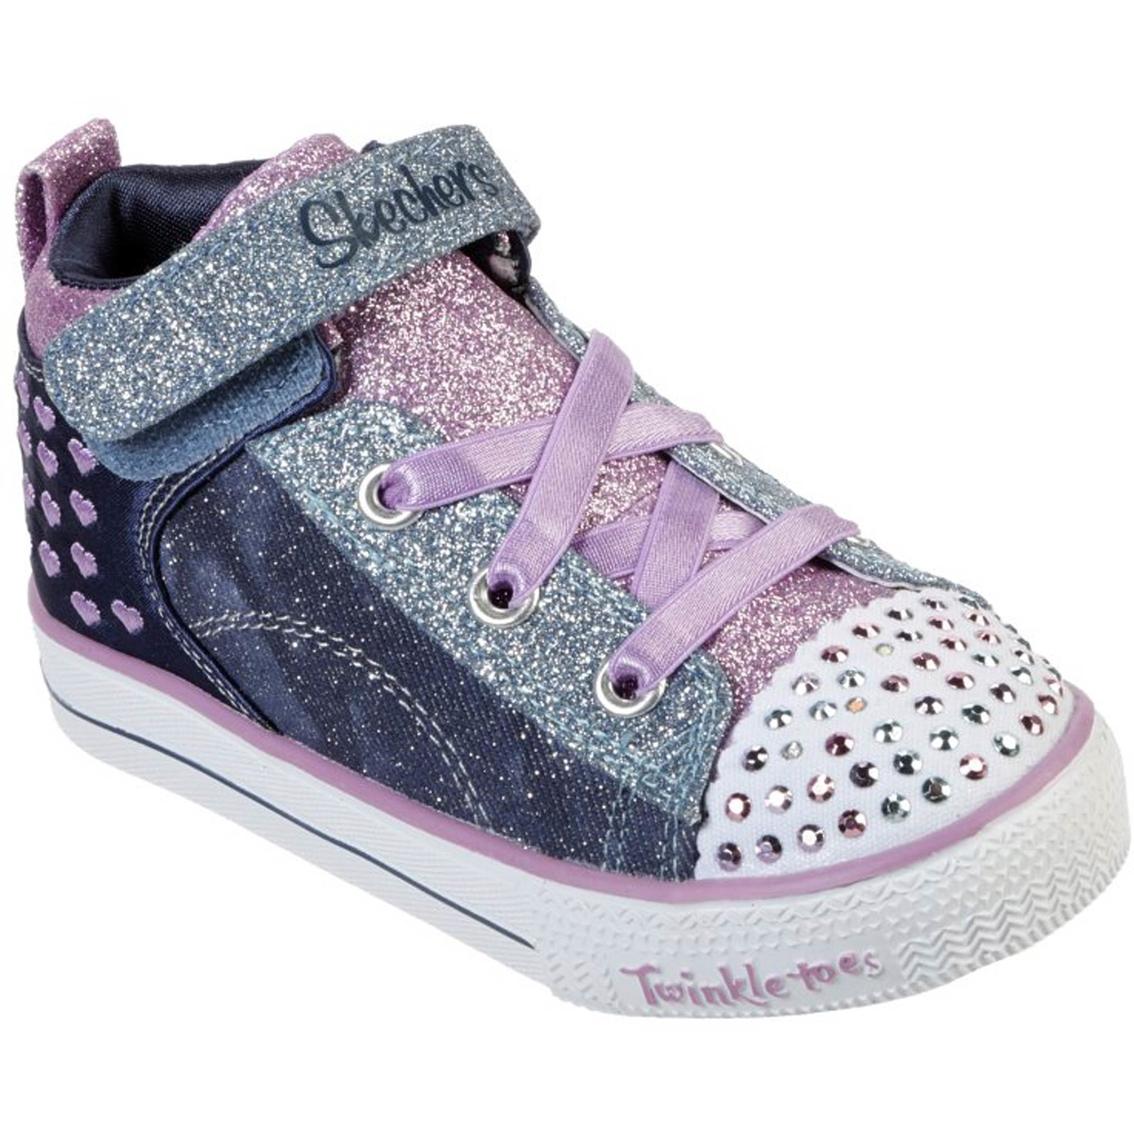 Skechers Toddler Girls Shuffle Lite Dainty Denim Shoes